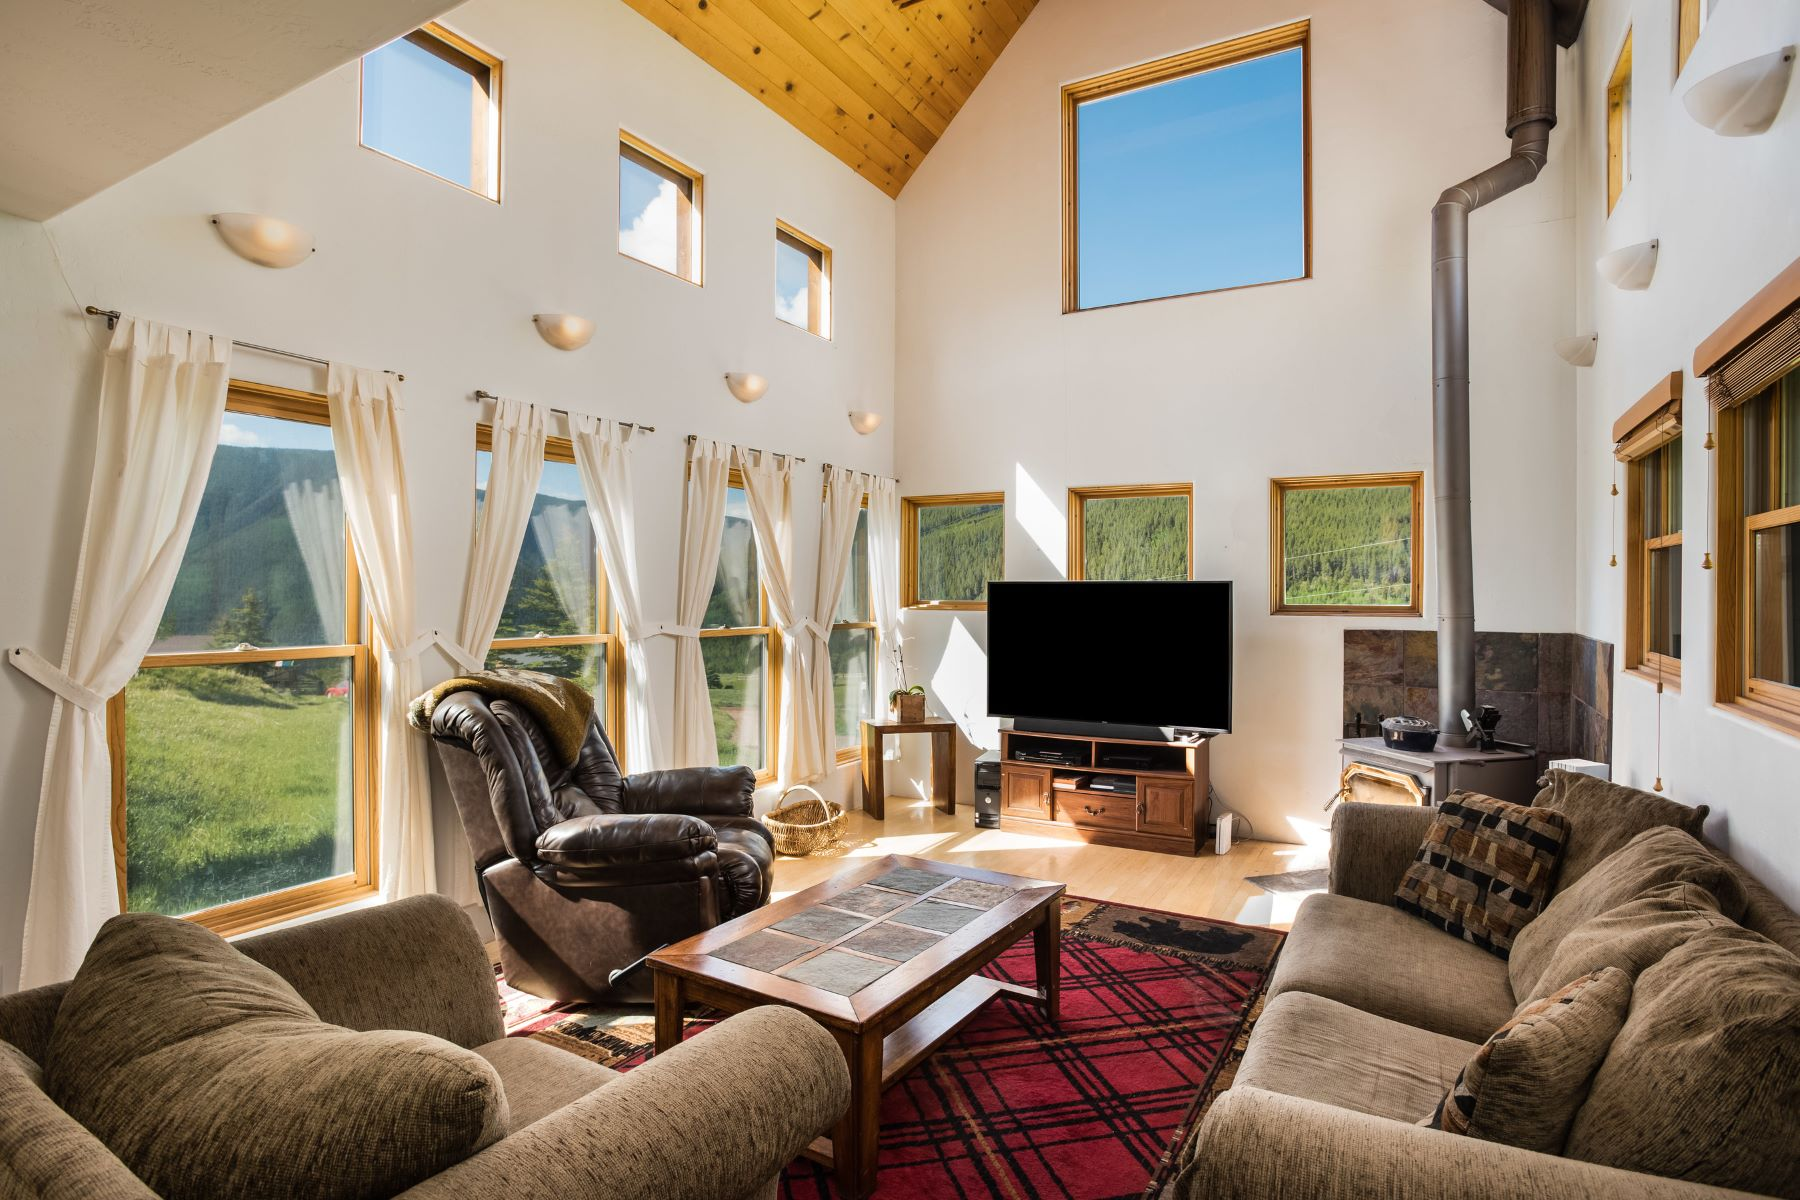 Property for Sale at Ruedi Shores 0133 Hawk Lane Basalt, Colorado 81621 United States